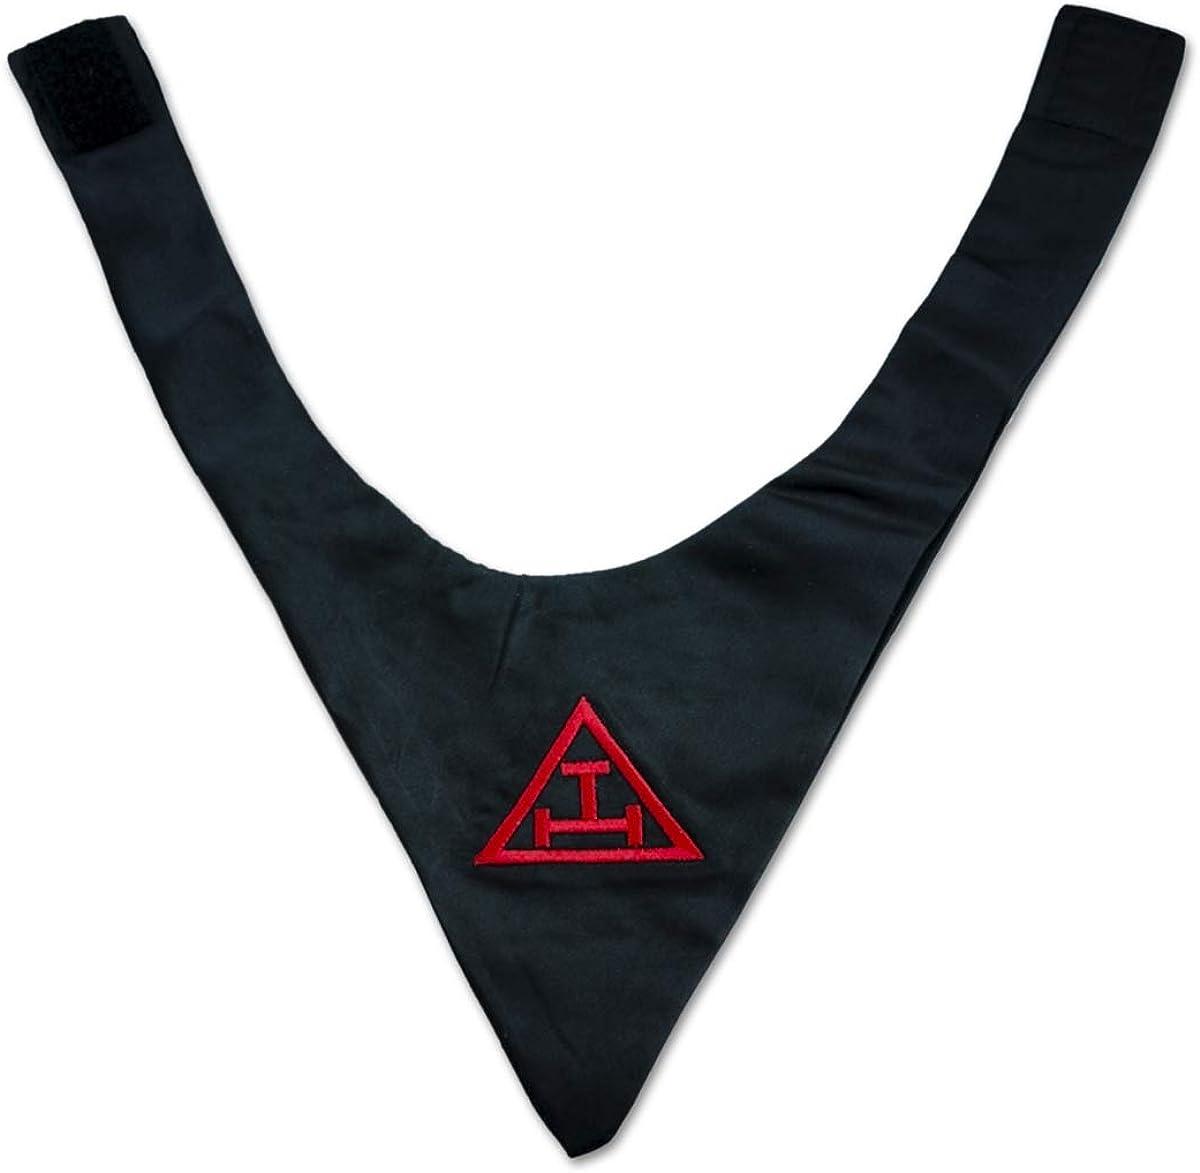 Royal Arch Satin Masonic Cravat - [Black]